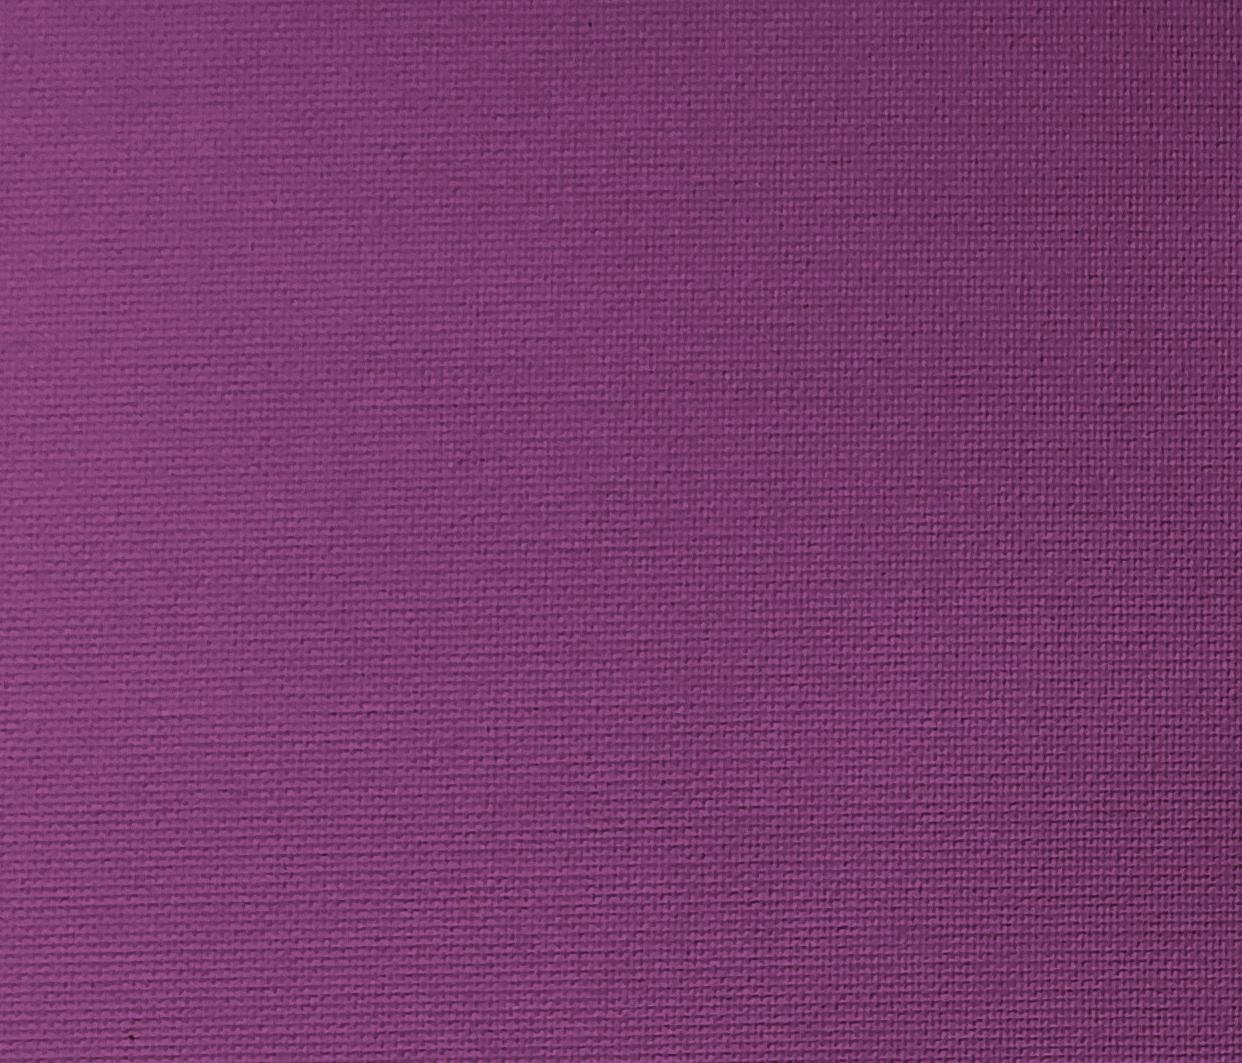 Eden Plum Blackout Blind Fabric